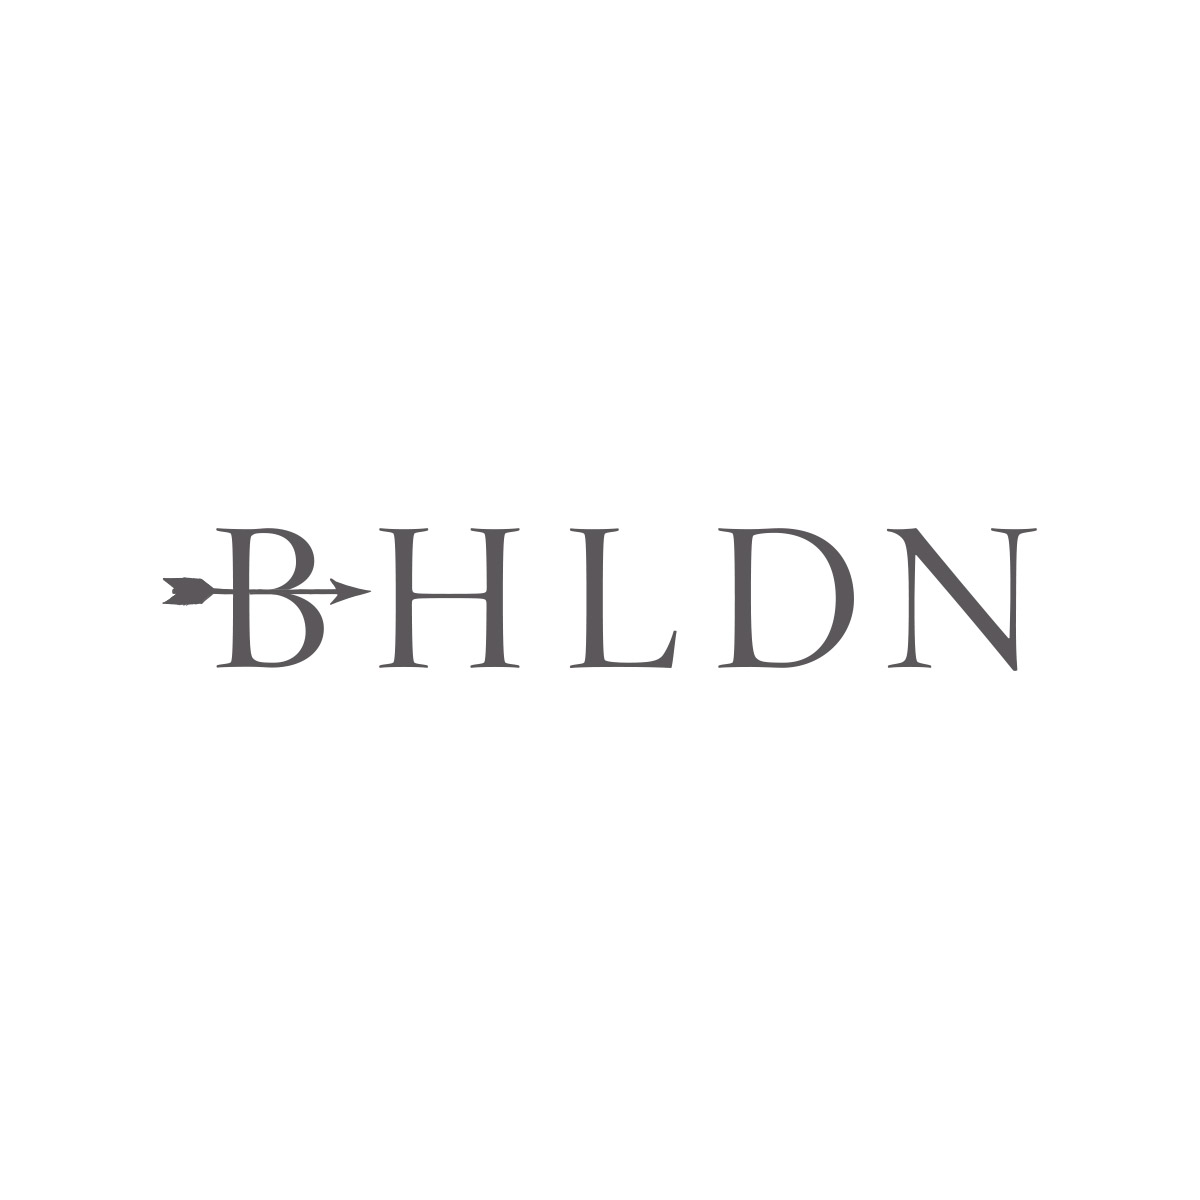 BHLDN.jpg